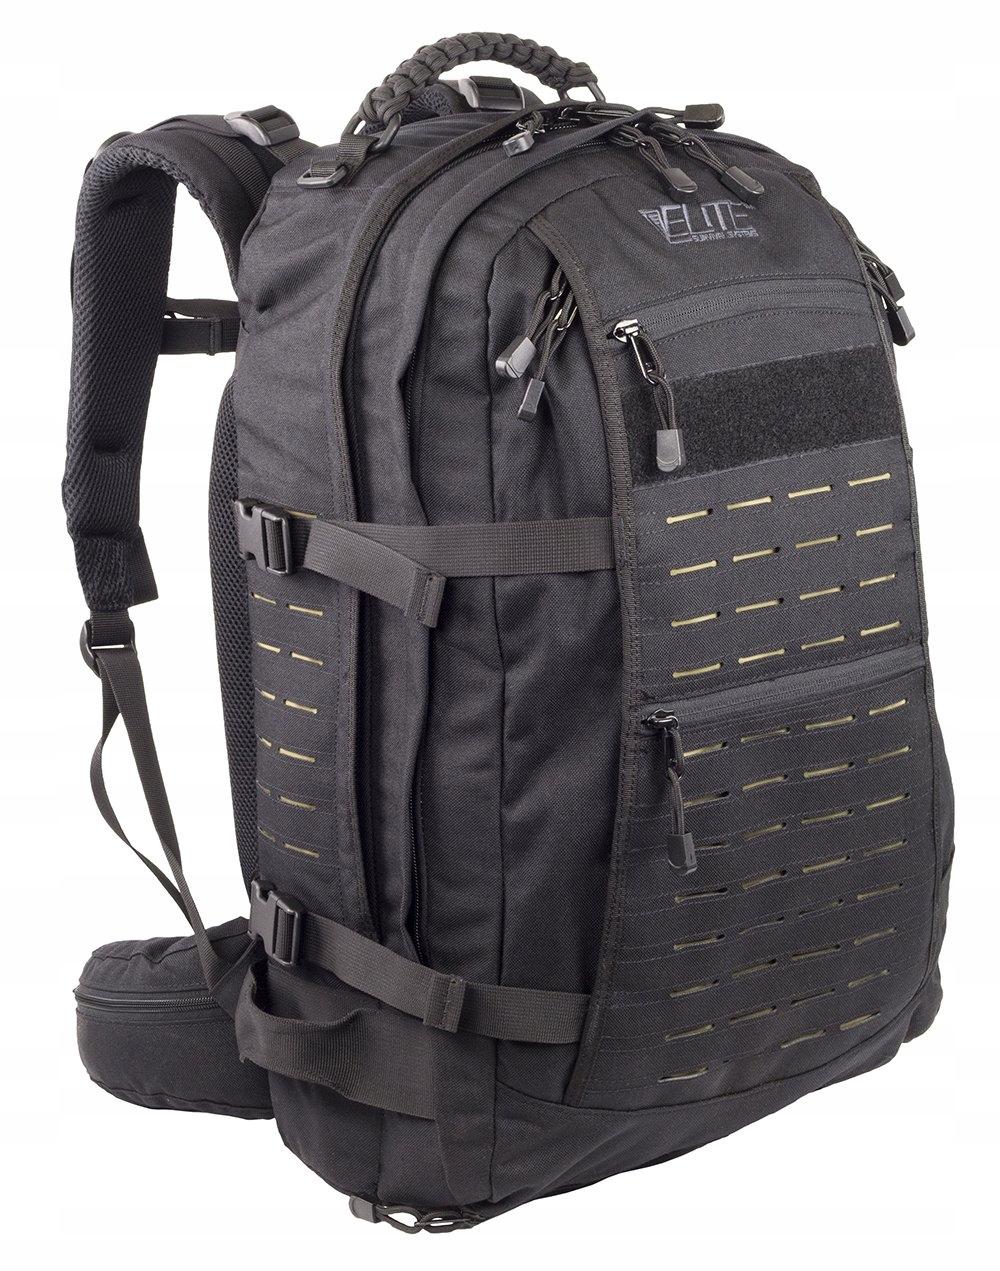 ELITE SURVIVAL plecak TAKTYCZNY outdoor 127-E